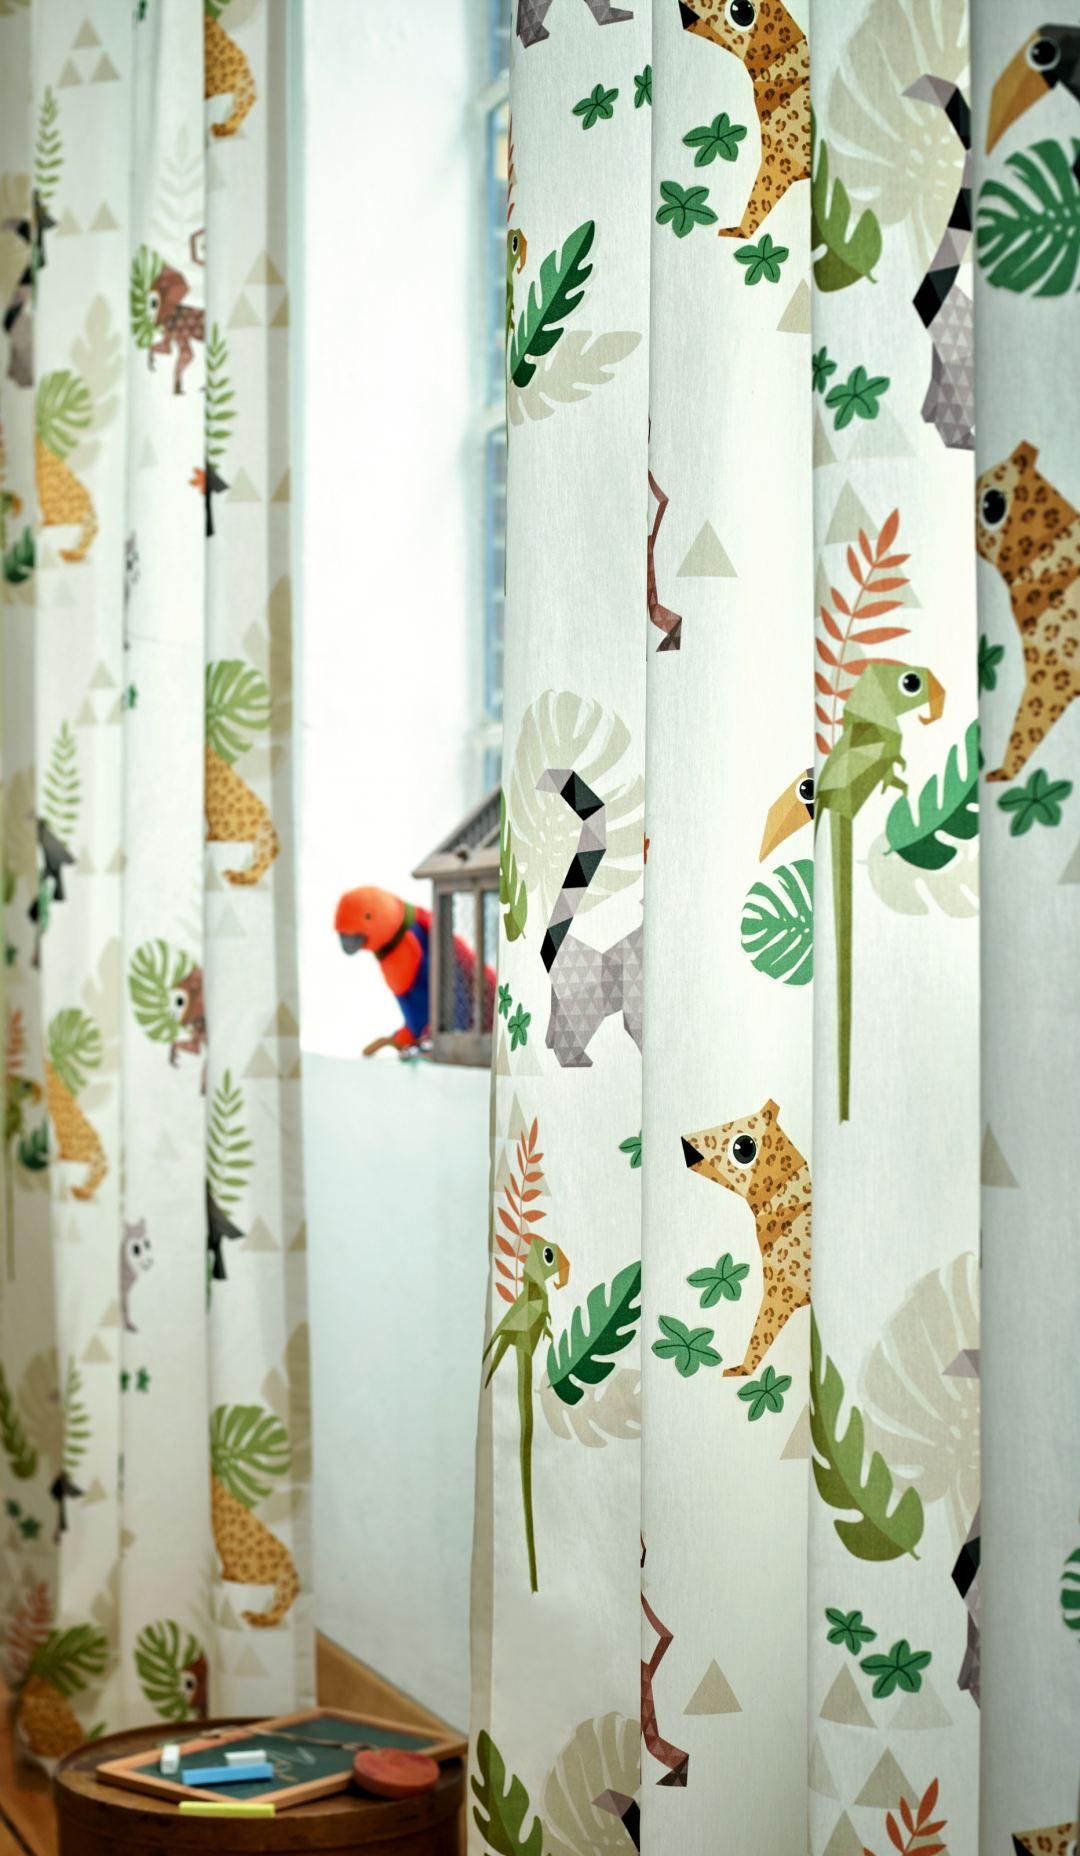 Groen Geel Zand Gordijn Jungle Art - In4305 05 Jungle Art